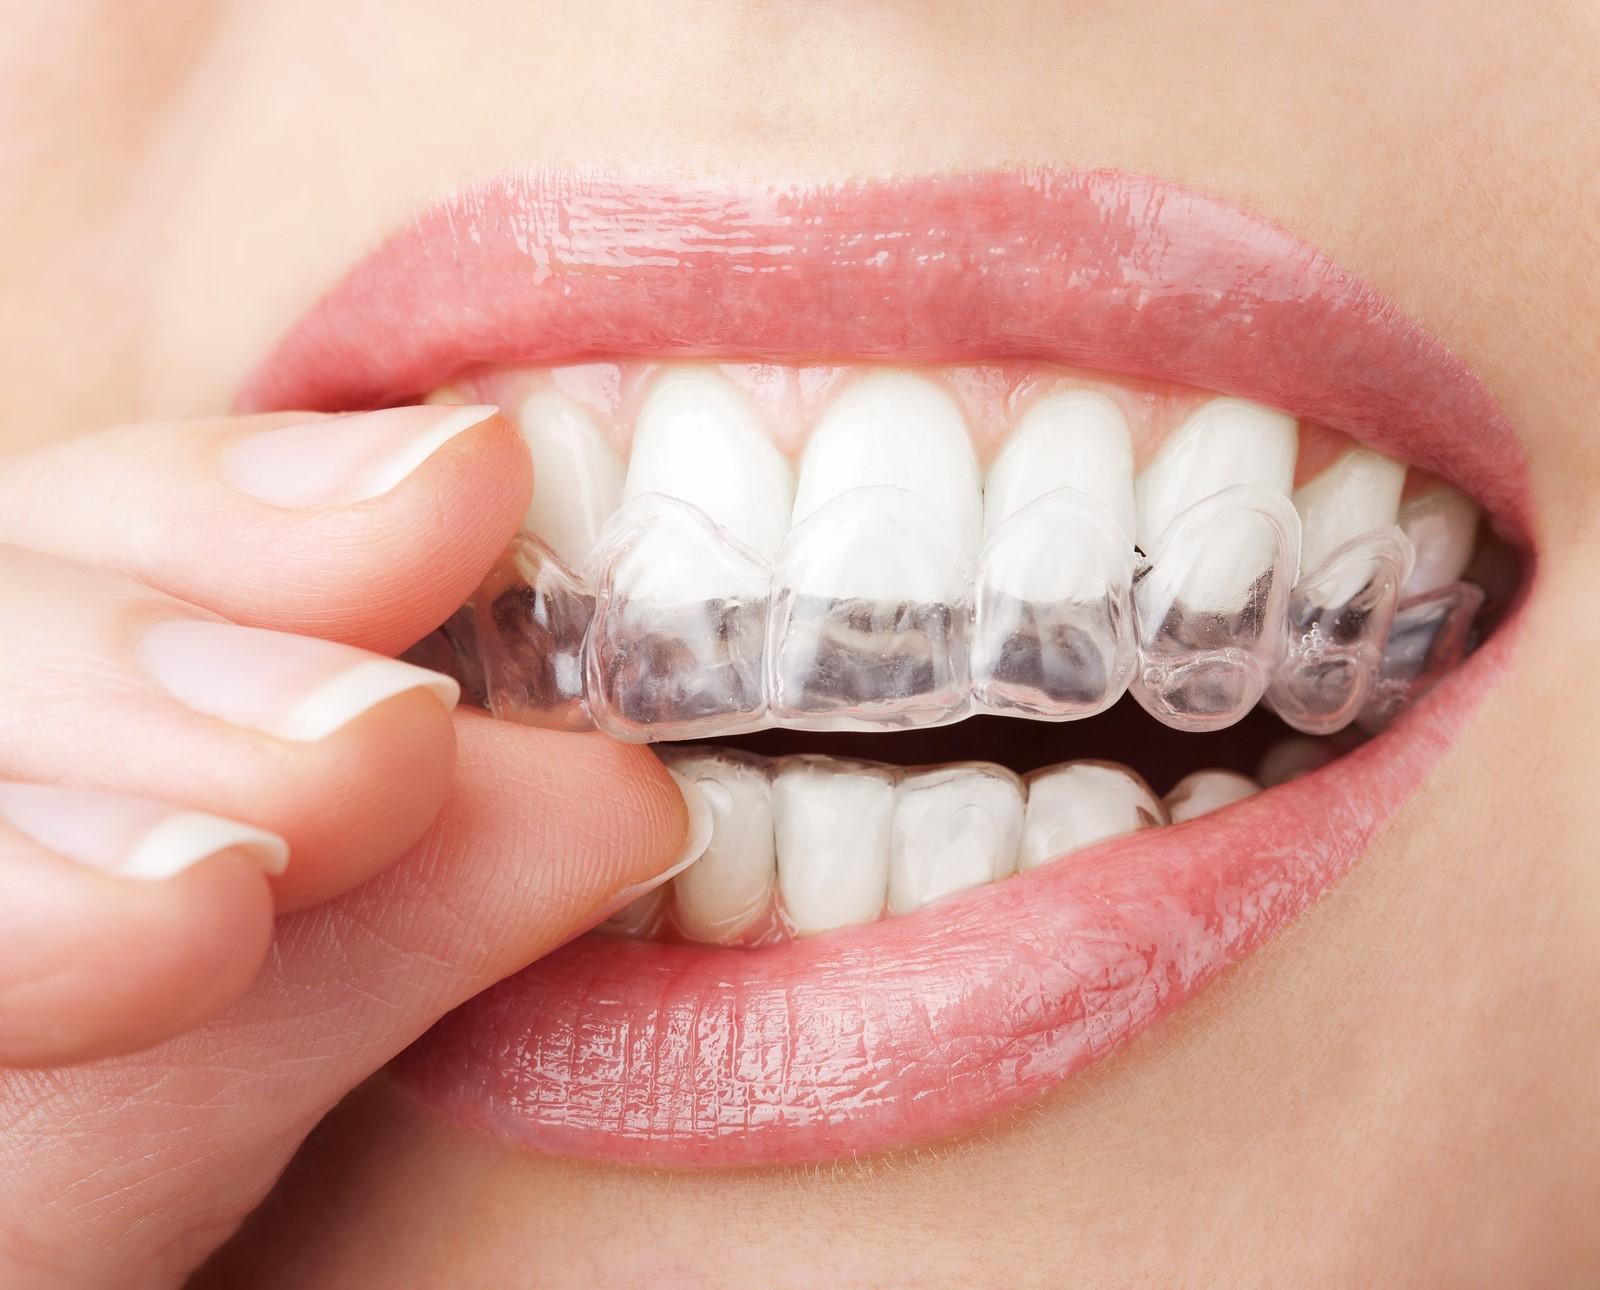 Treating Malocclusion through Atlanta Cosmetic Dentistry Procedures